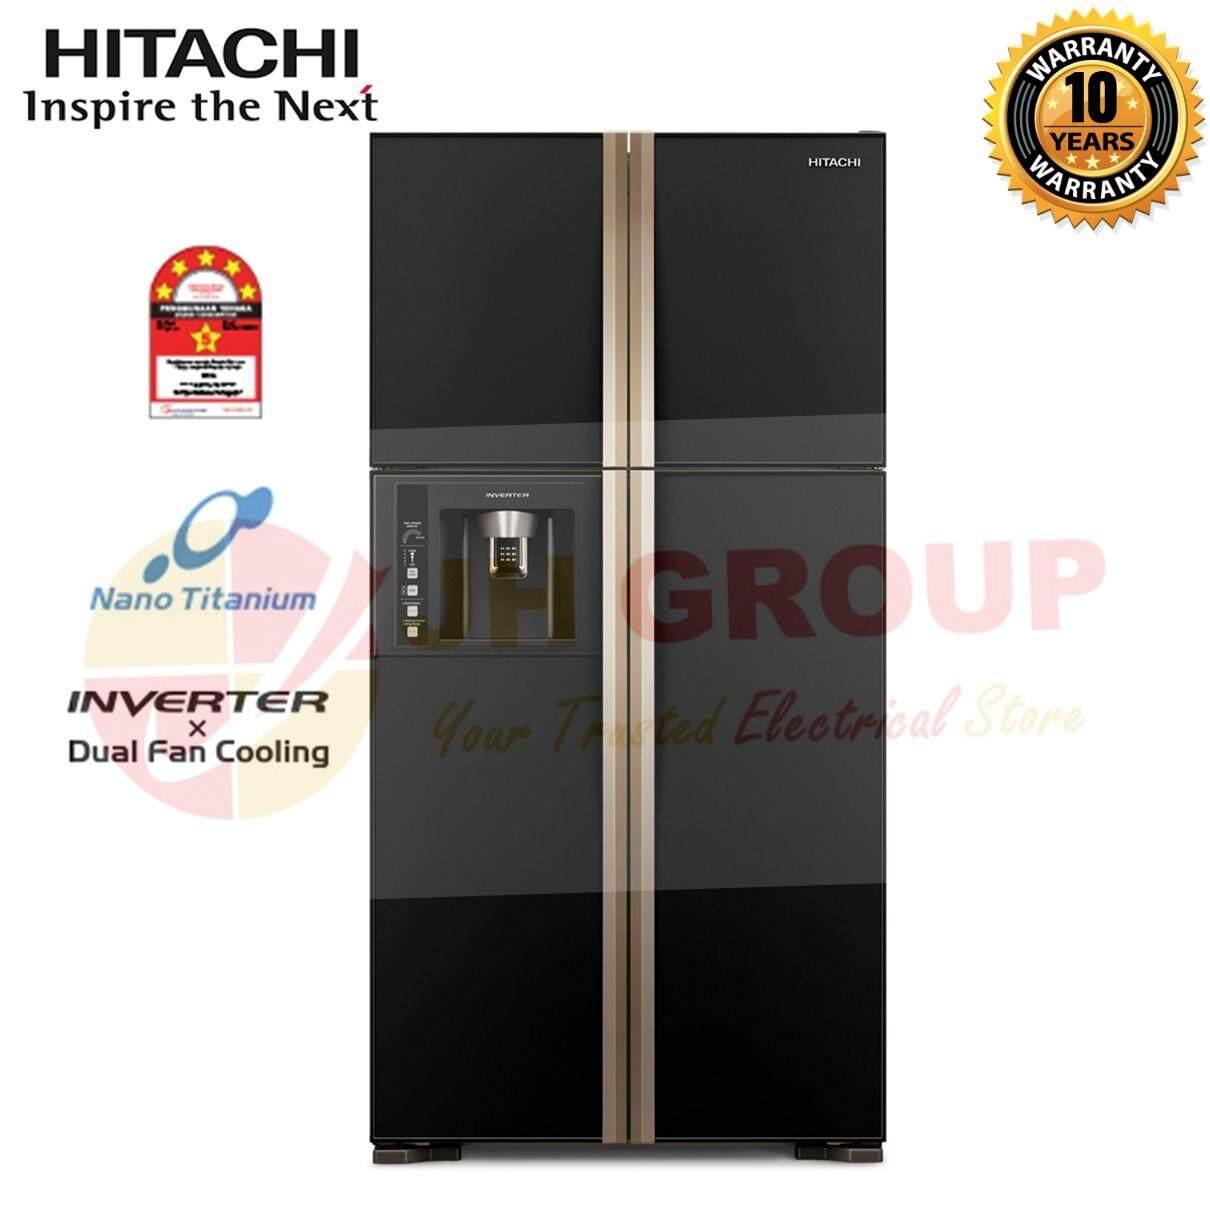 Hitachi Refrigerator Price In Malaysia Best Hitachi Refrigerator